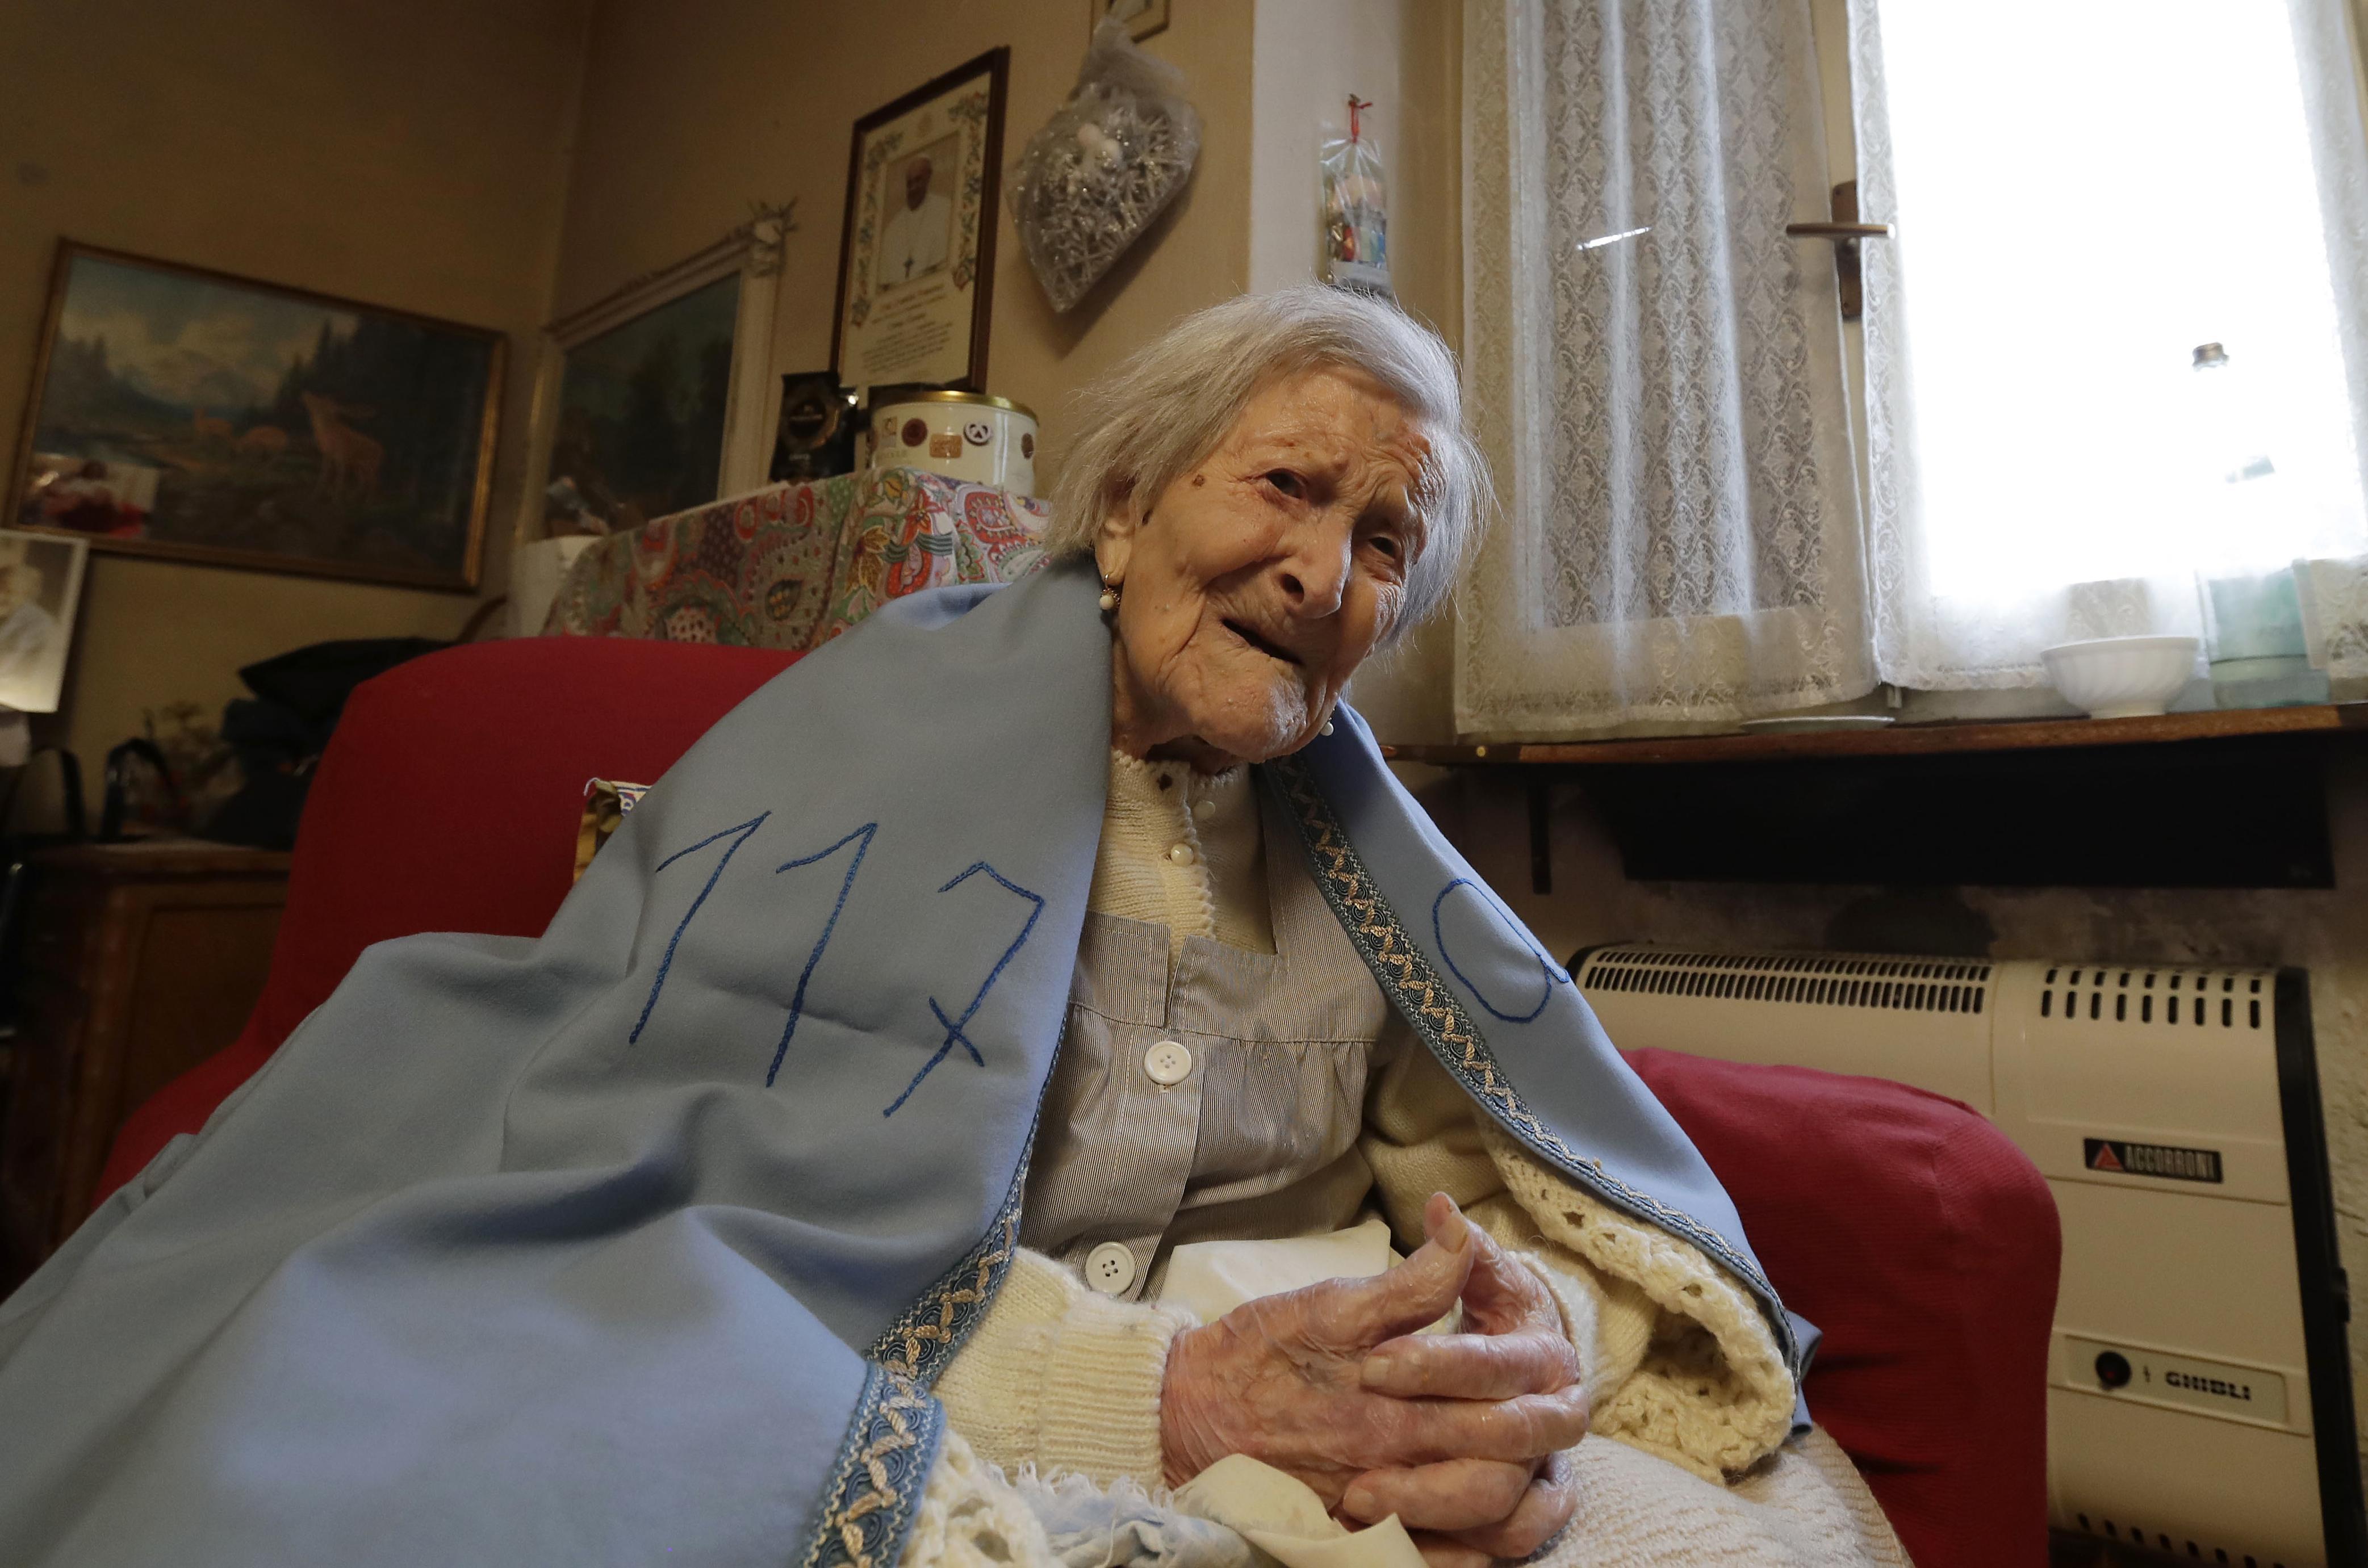 c6639ac5147a2b World s oldest living person celebrates 117th birthday